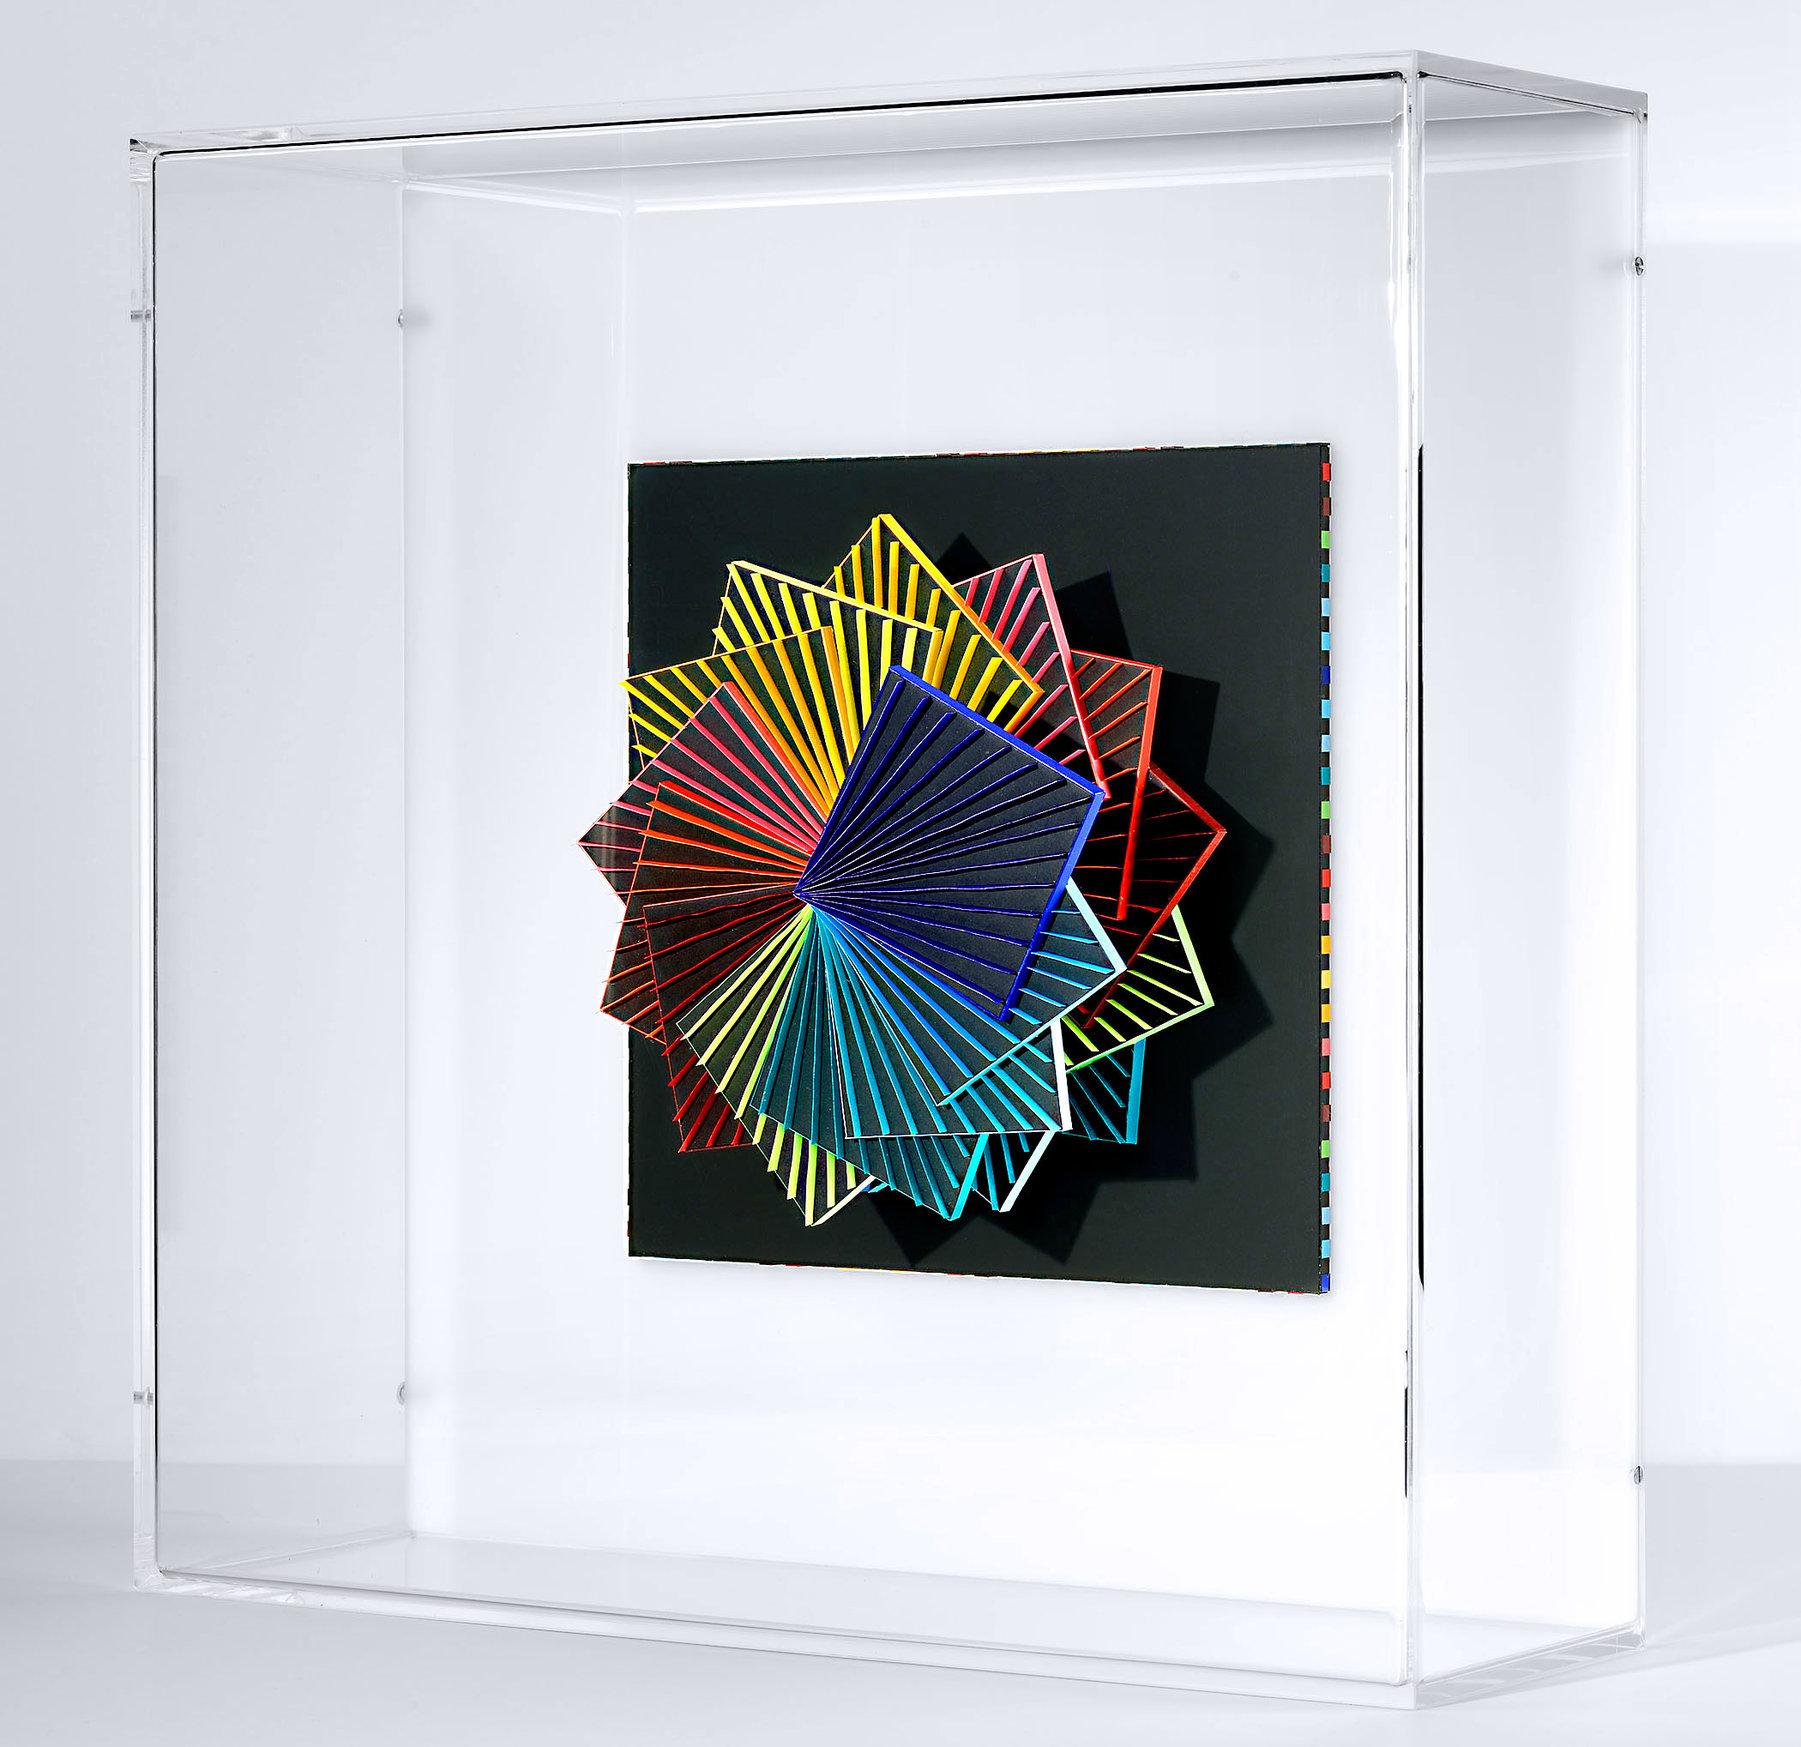 Francoise LUCIANI spirale-coul-45x45-cm.jpg